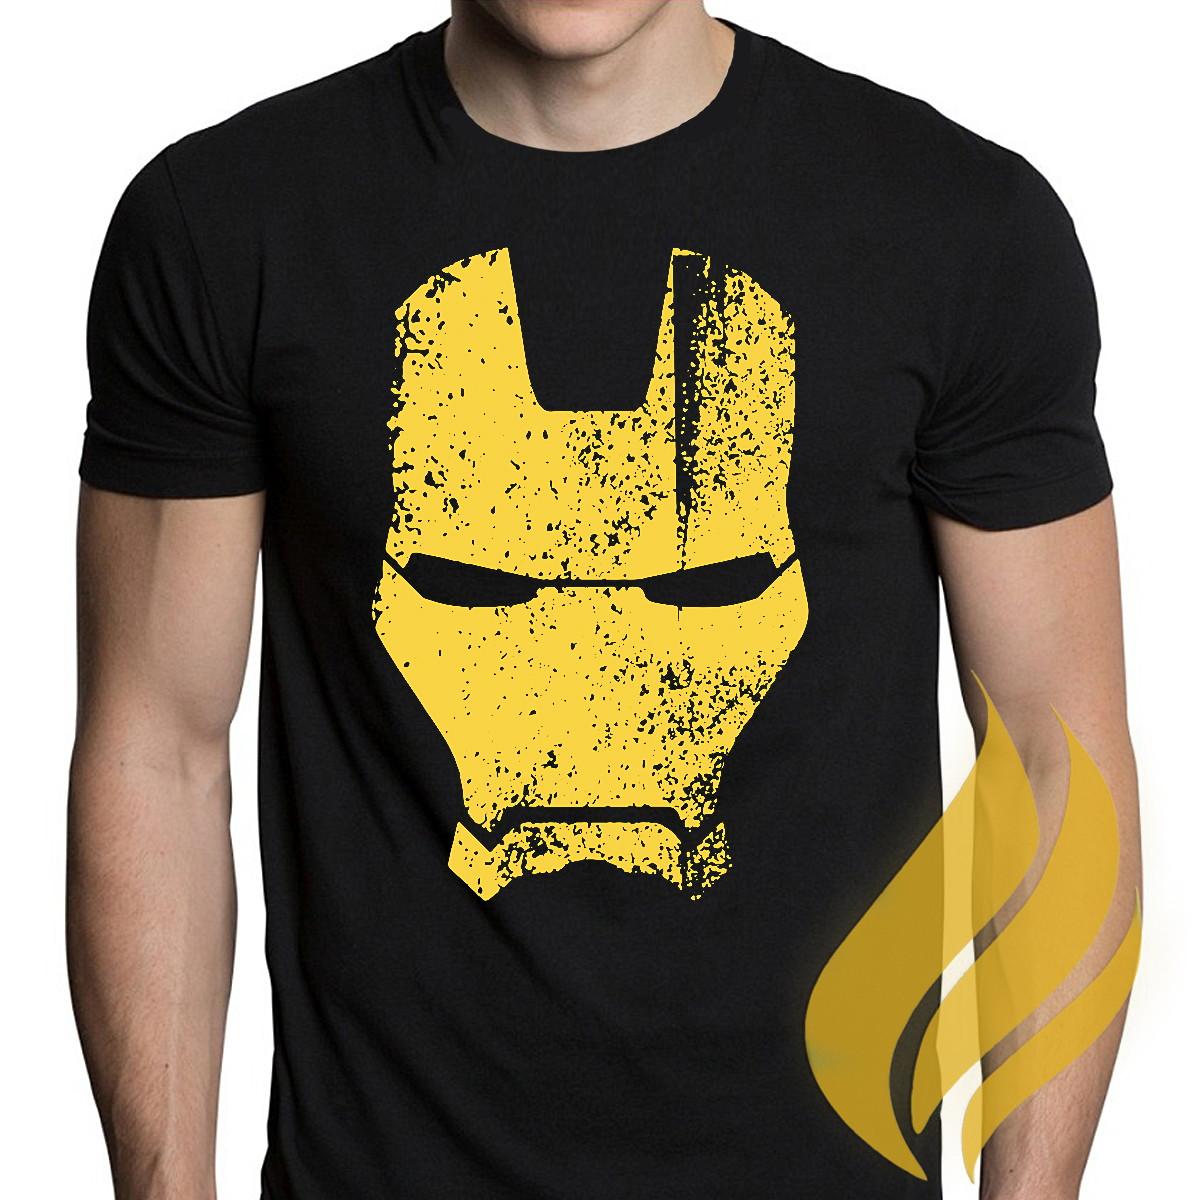 a152c05463 Camiseta Personalizada Homem de Ferro Tony Stark | Elo7